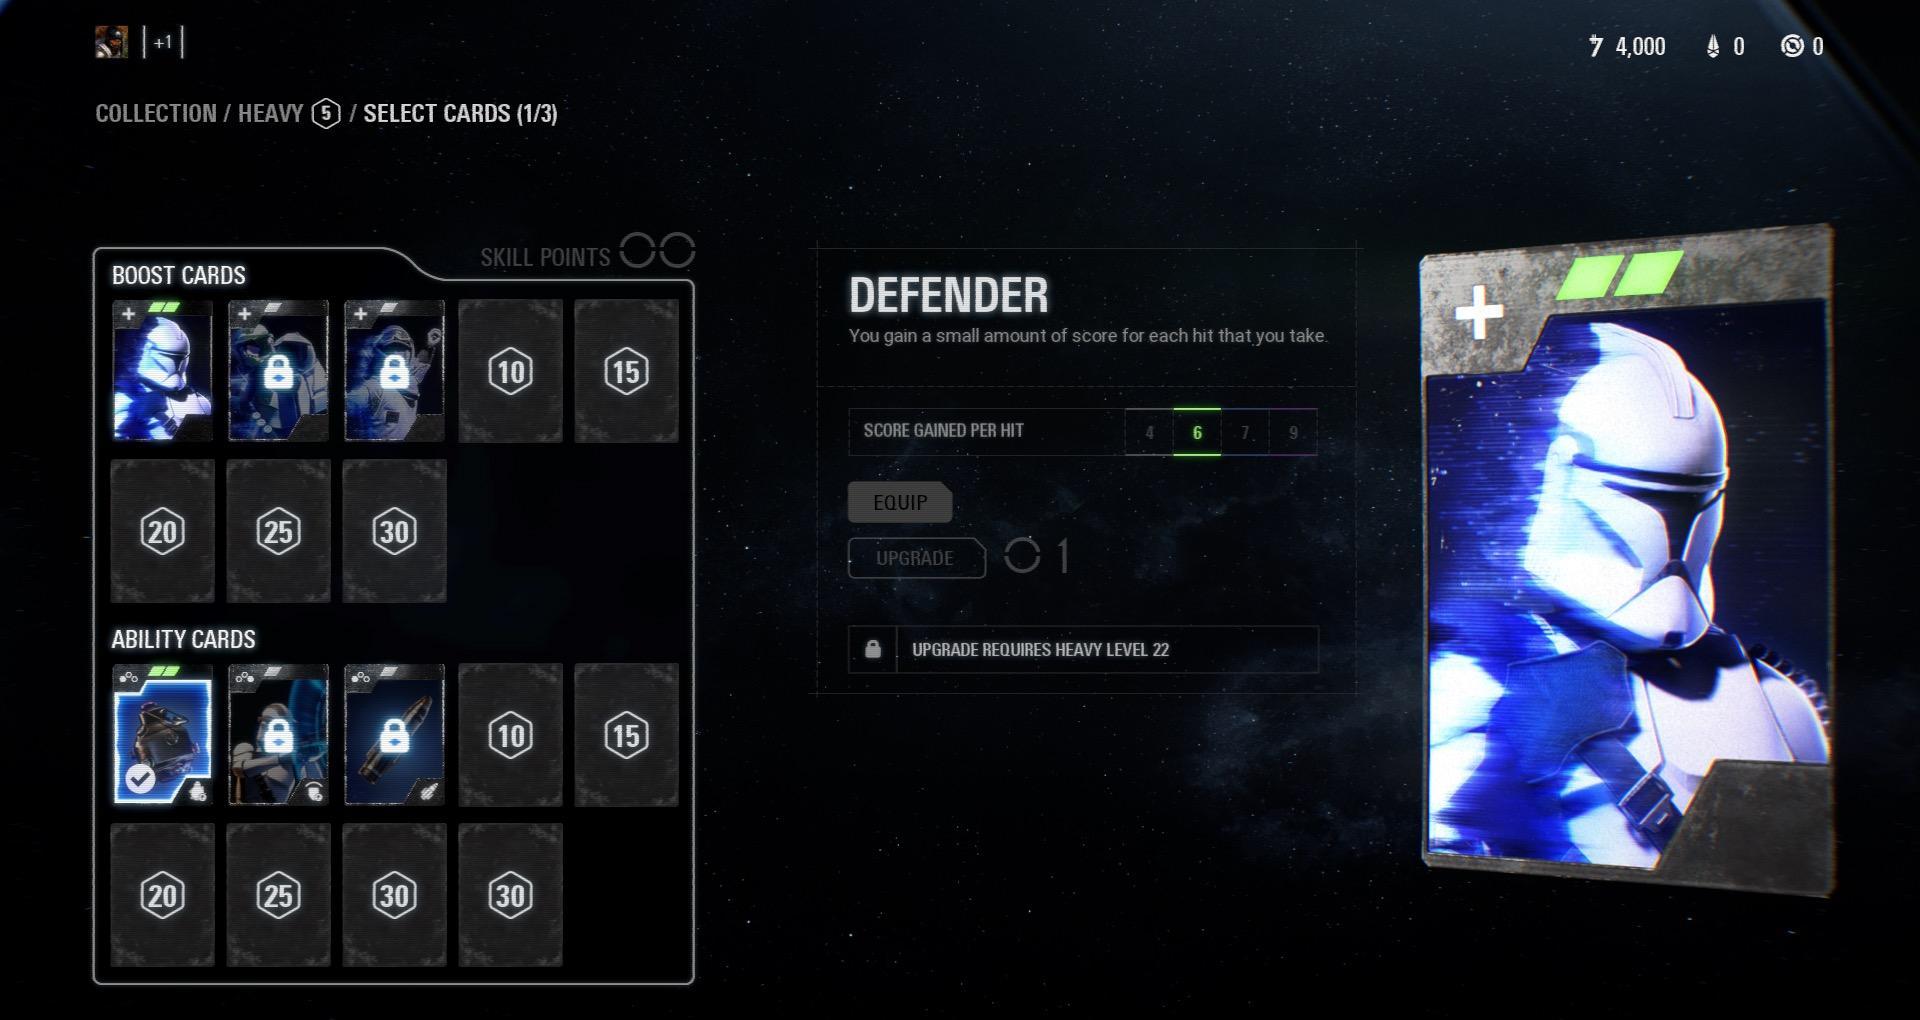 Star Wars Battlefront 2 S Progression Changes Now Live